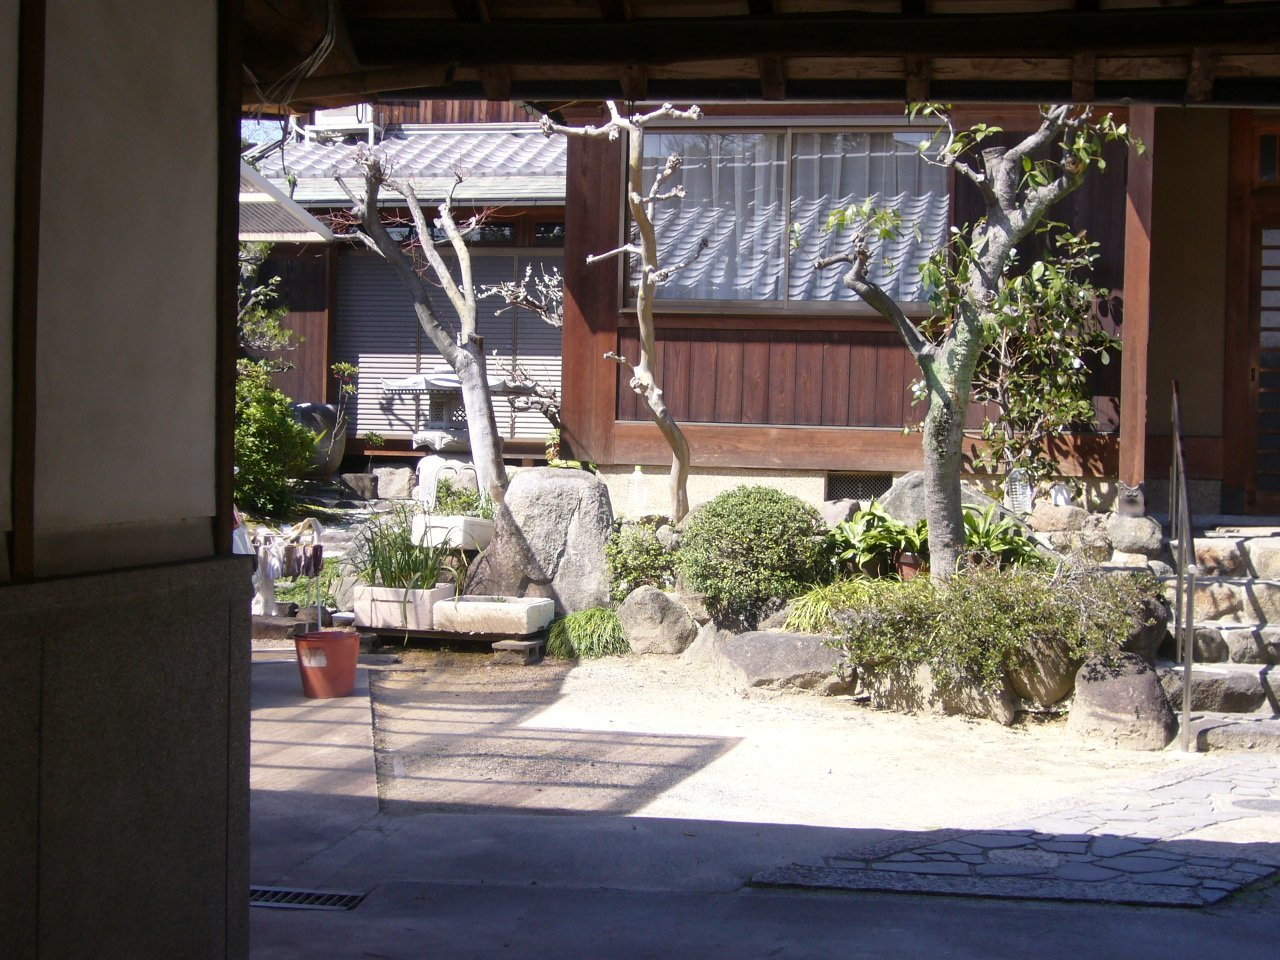 枚方市の寺院 大隆寺_c0112559_09264644.jpg